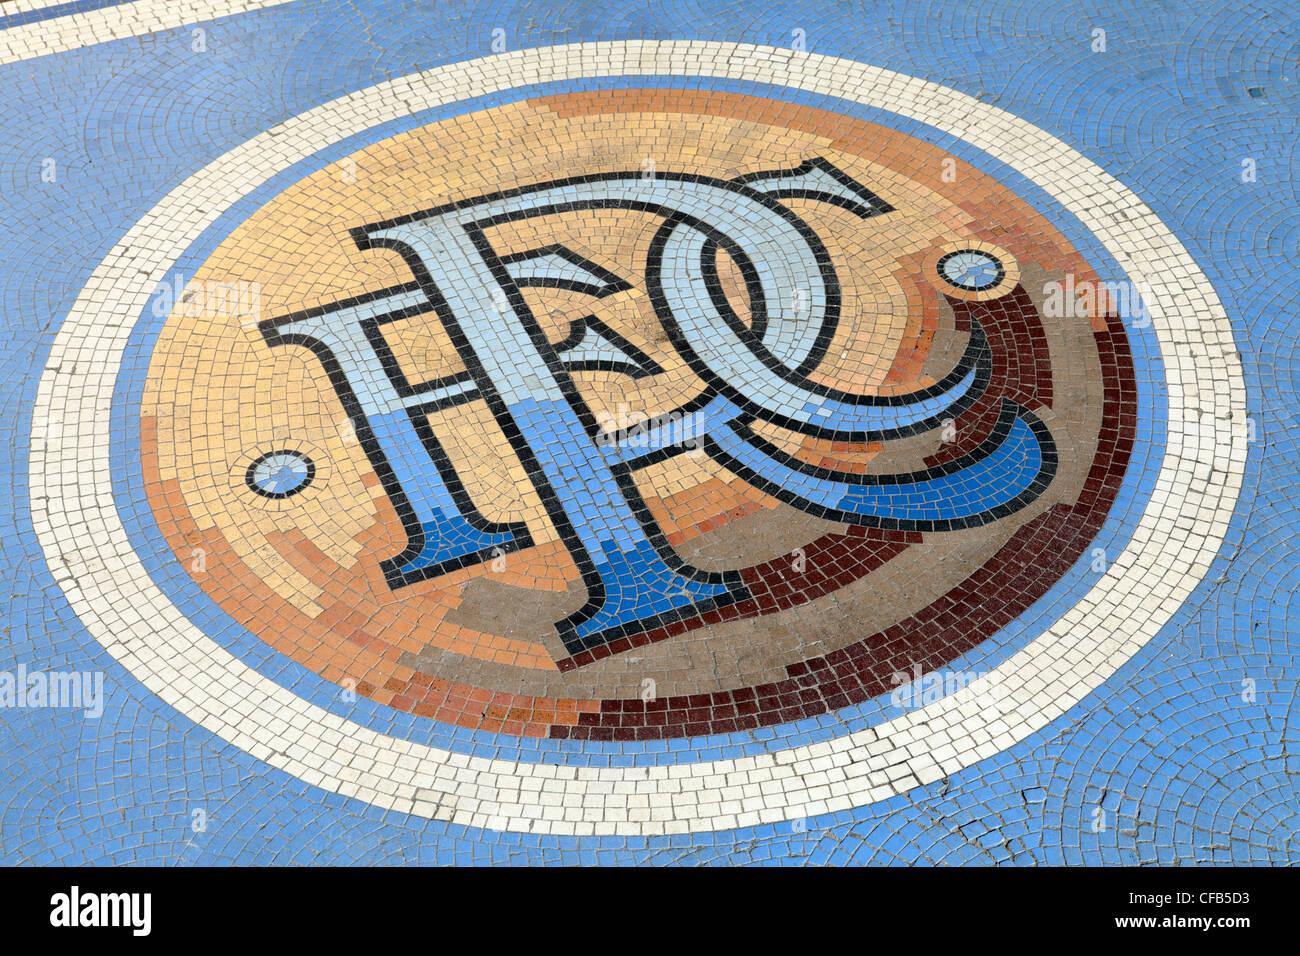 A mosaic of the Glasgow Rangers Football Club crest at Ibrox Stadium, Scotland, UK - Stock Image